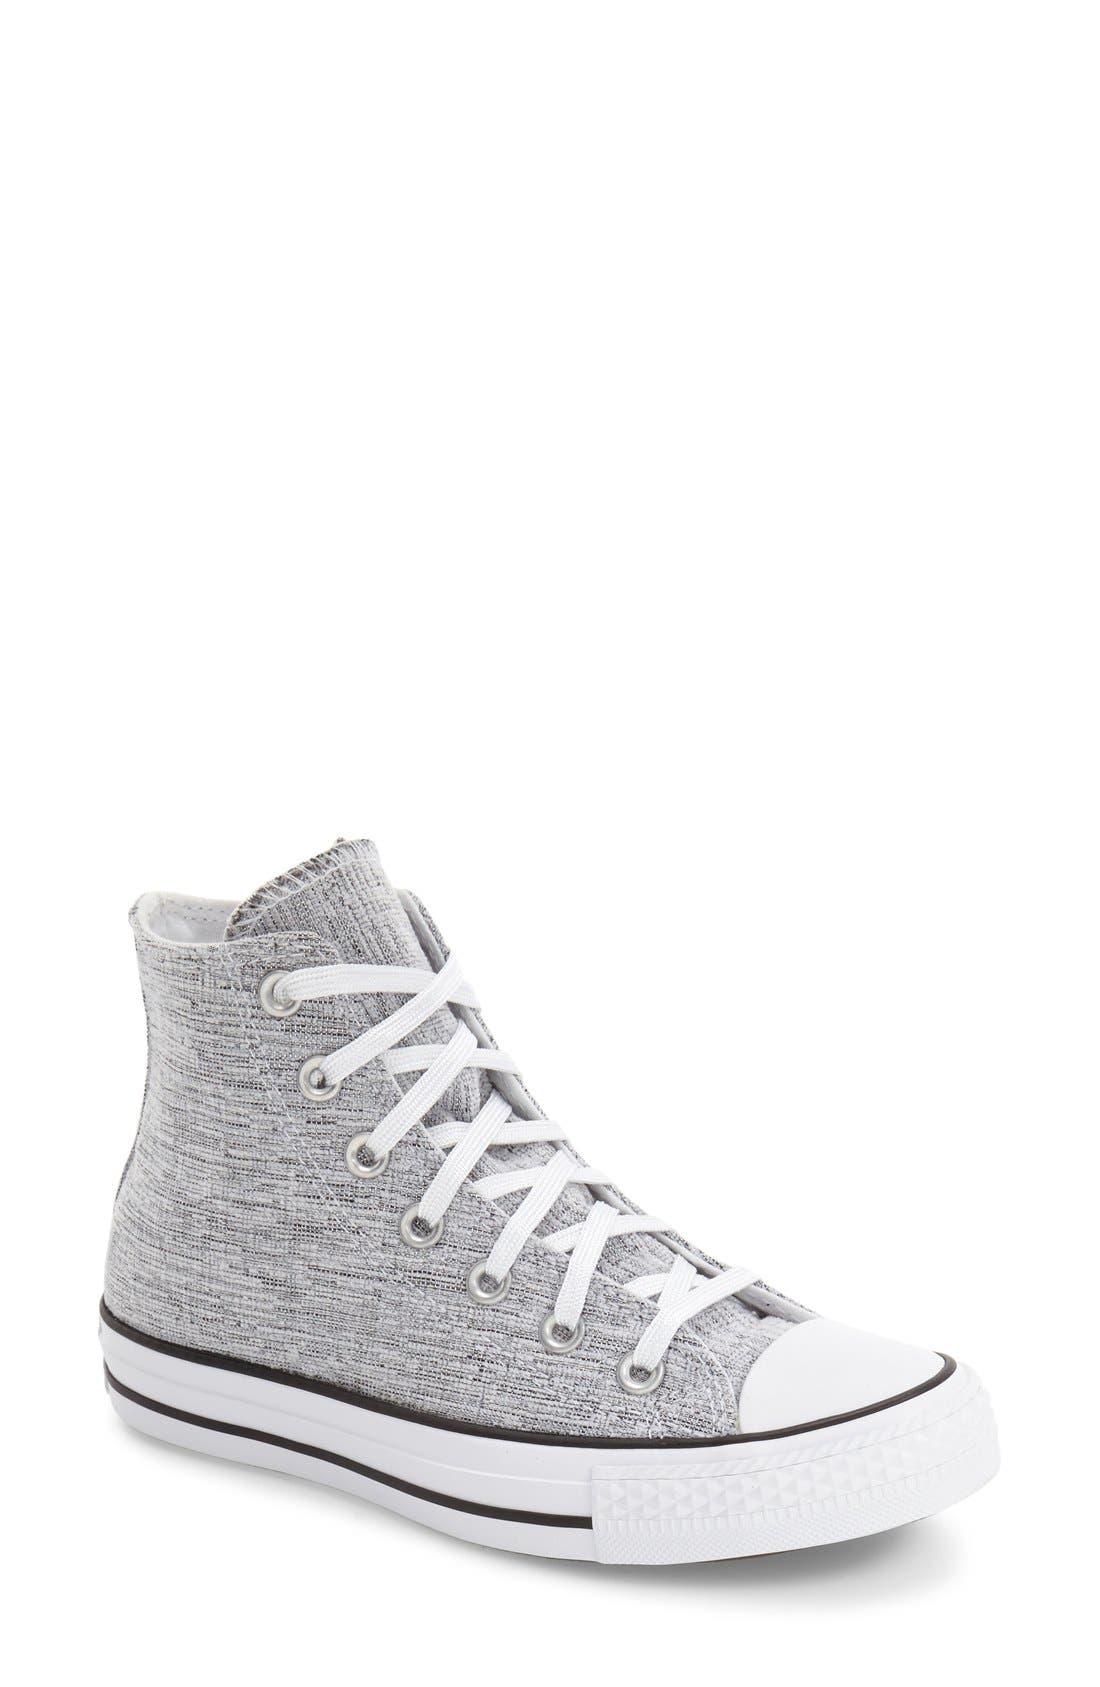 Main Image - Converse Chuck Taylor® All Star® Knit High Top Sneaker (Women)